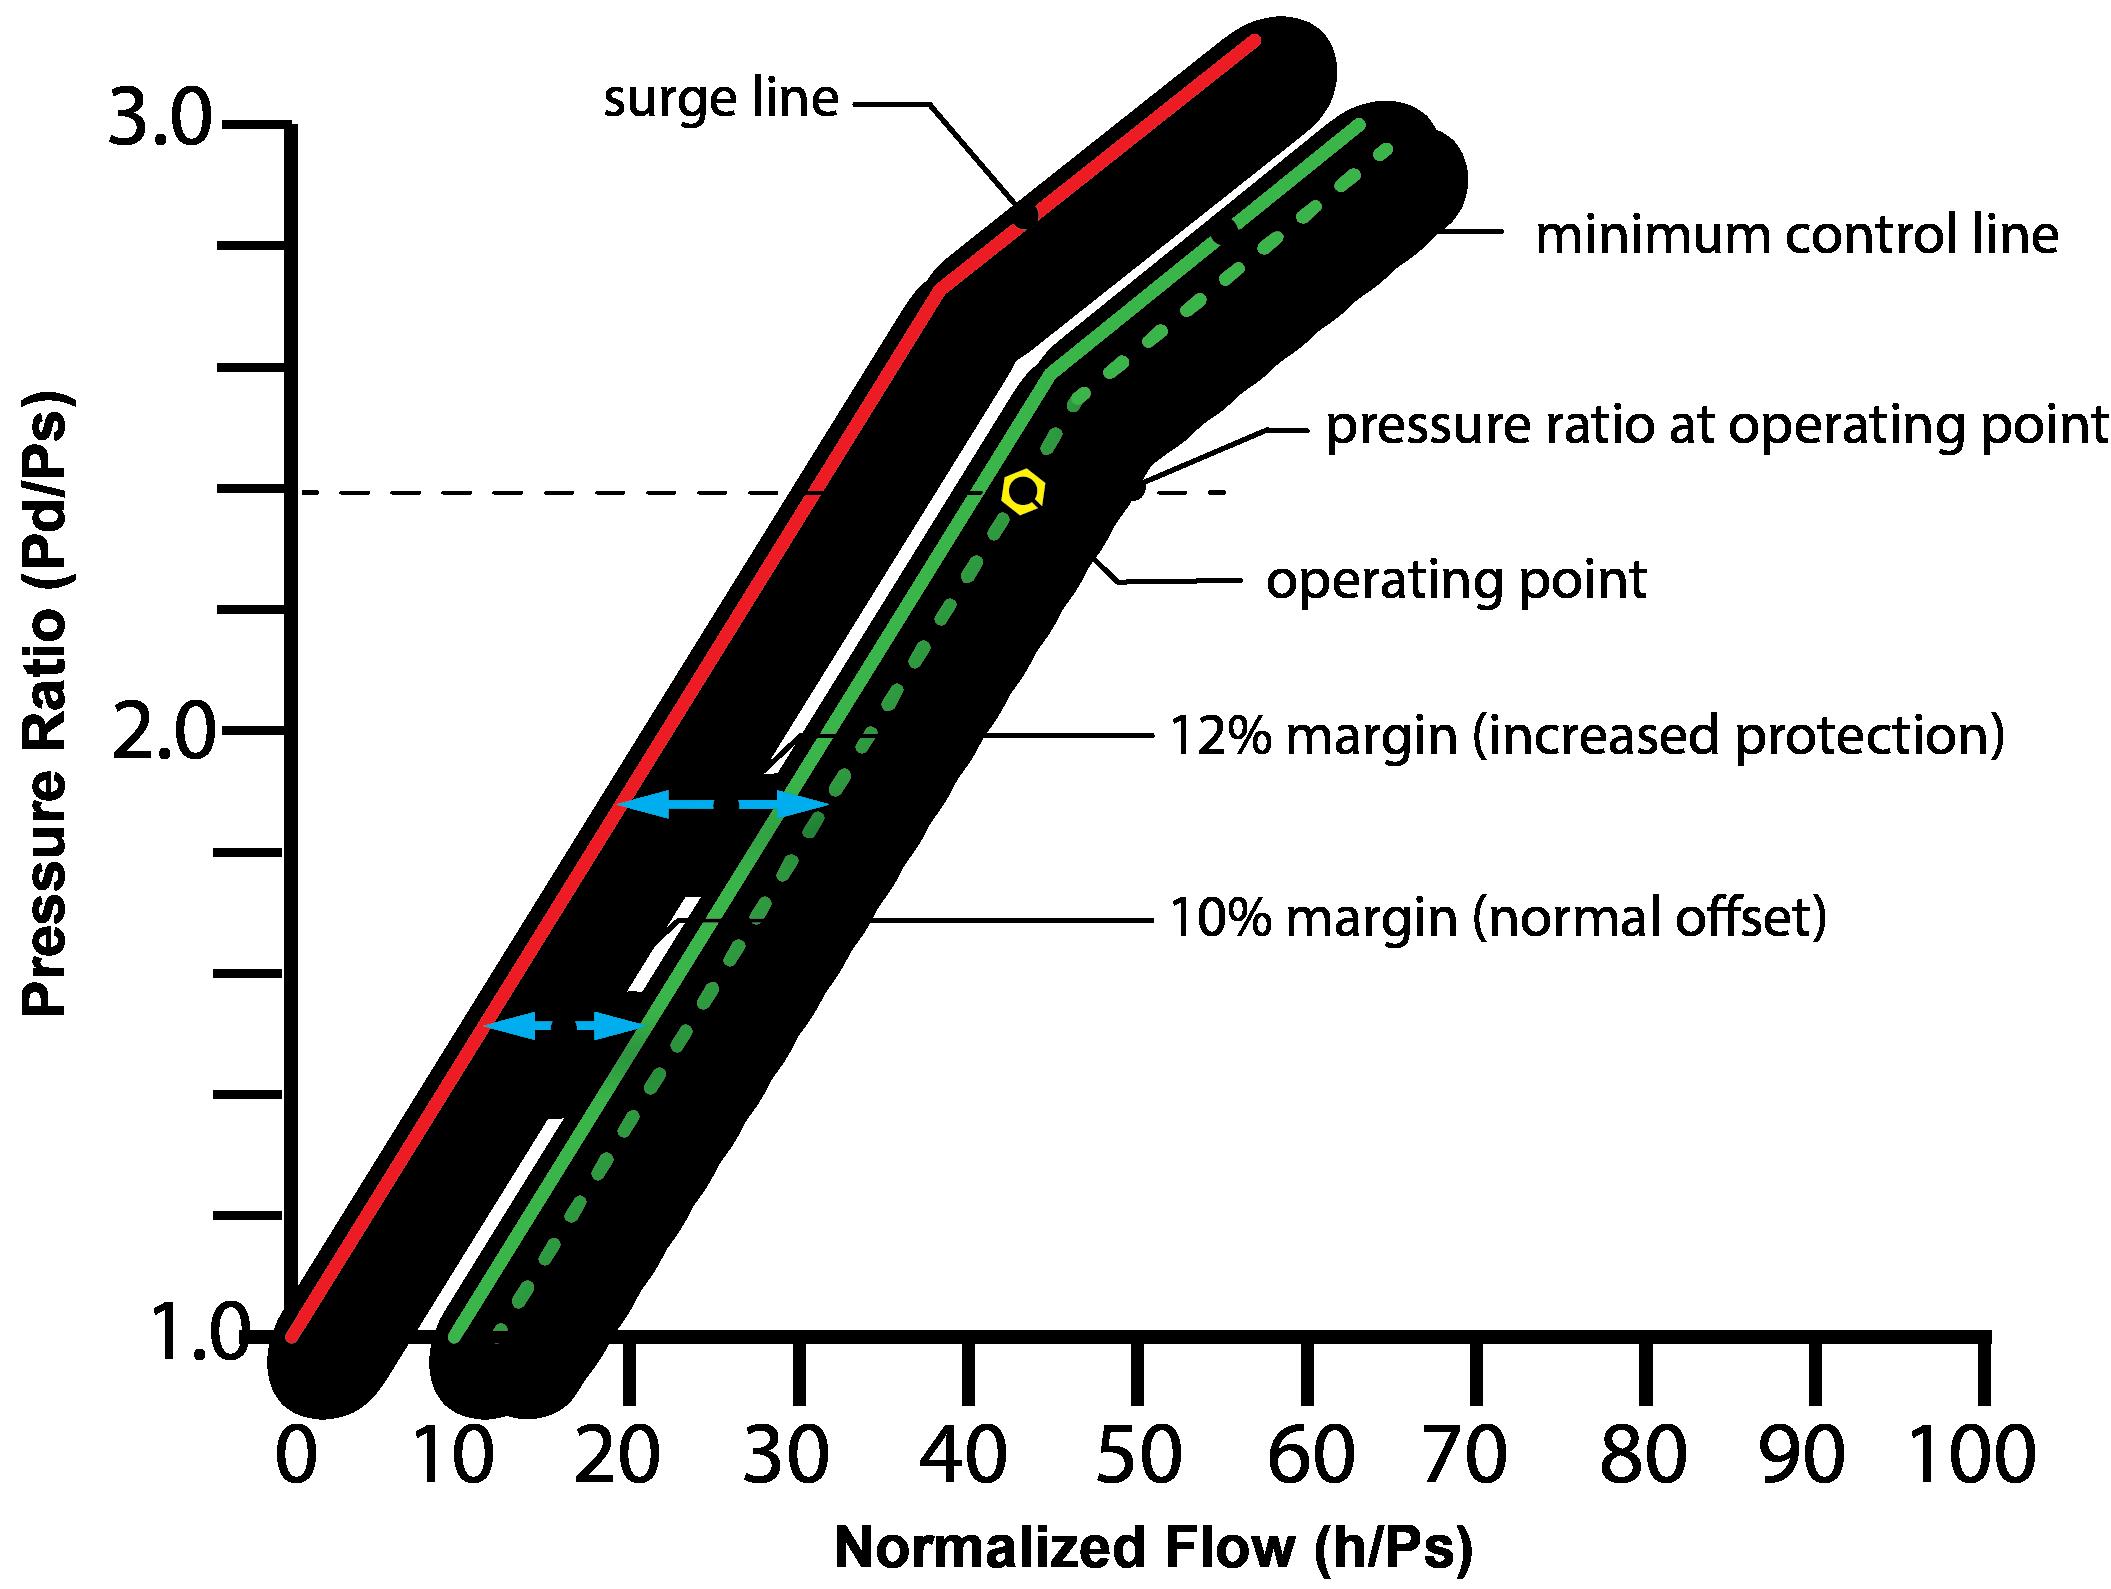 Adaptive control line